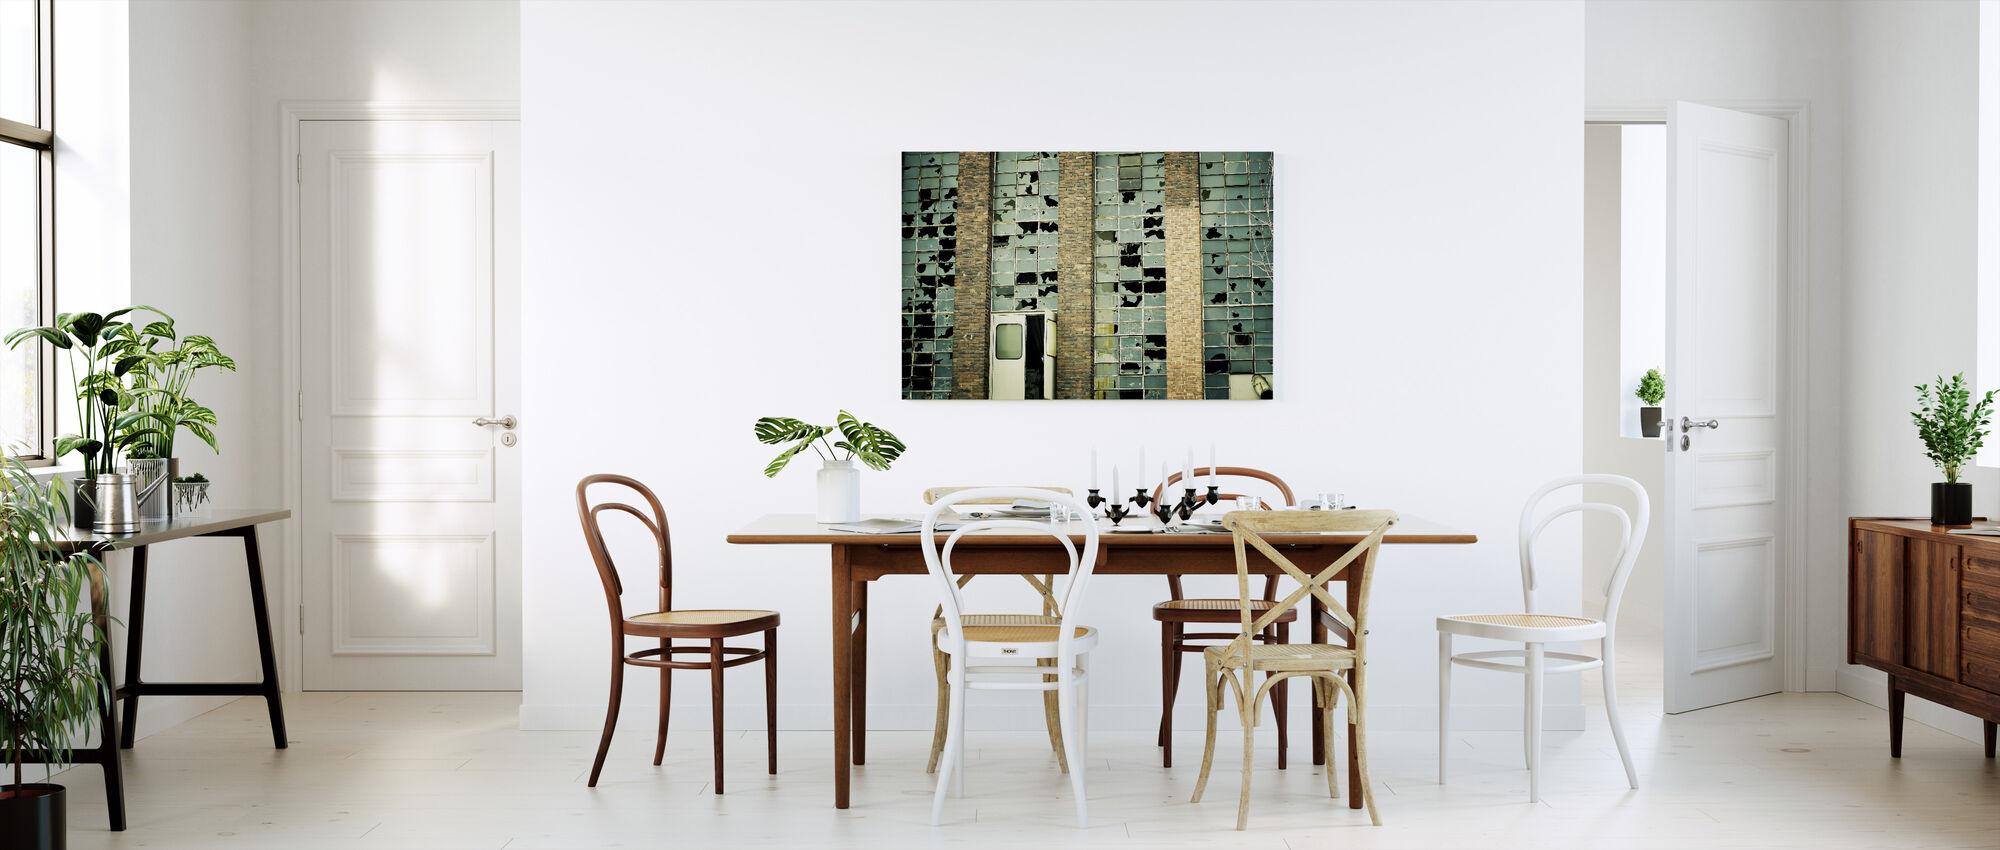 Broken Factory Glasses - Canvas print - Kitchen